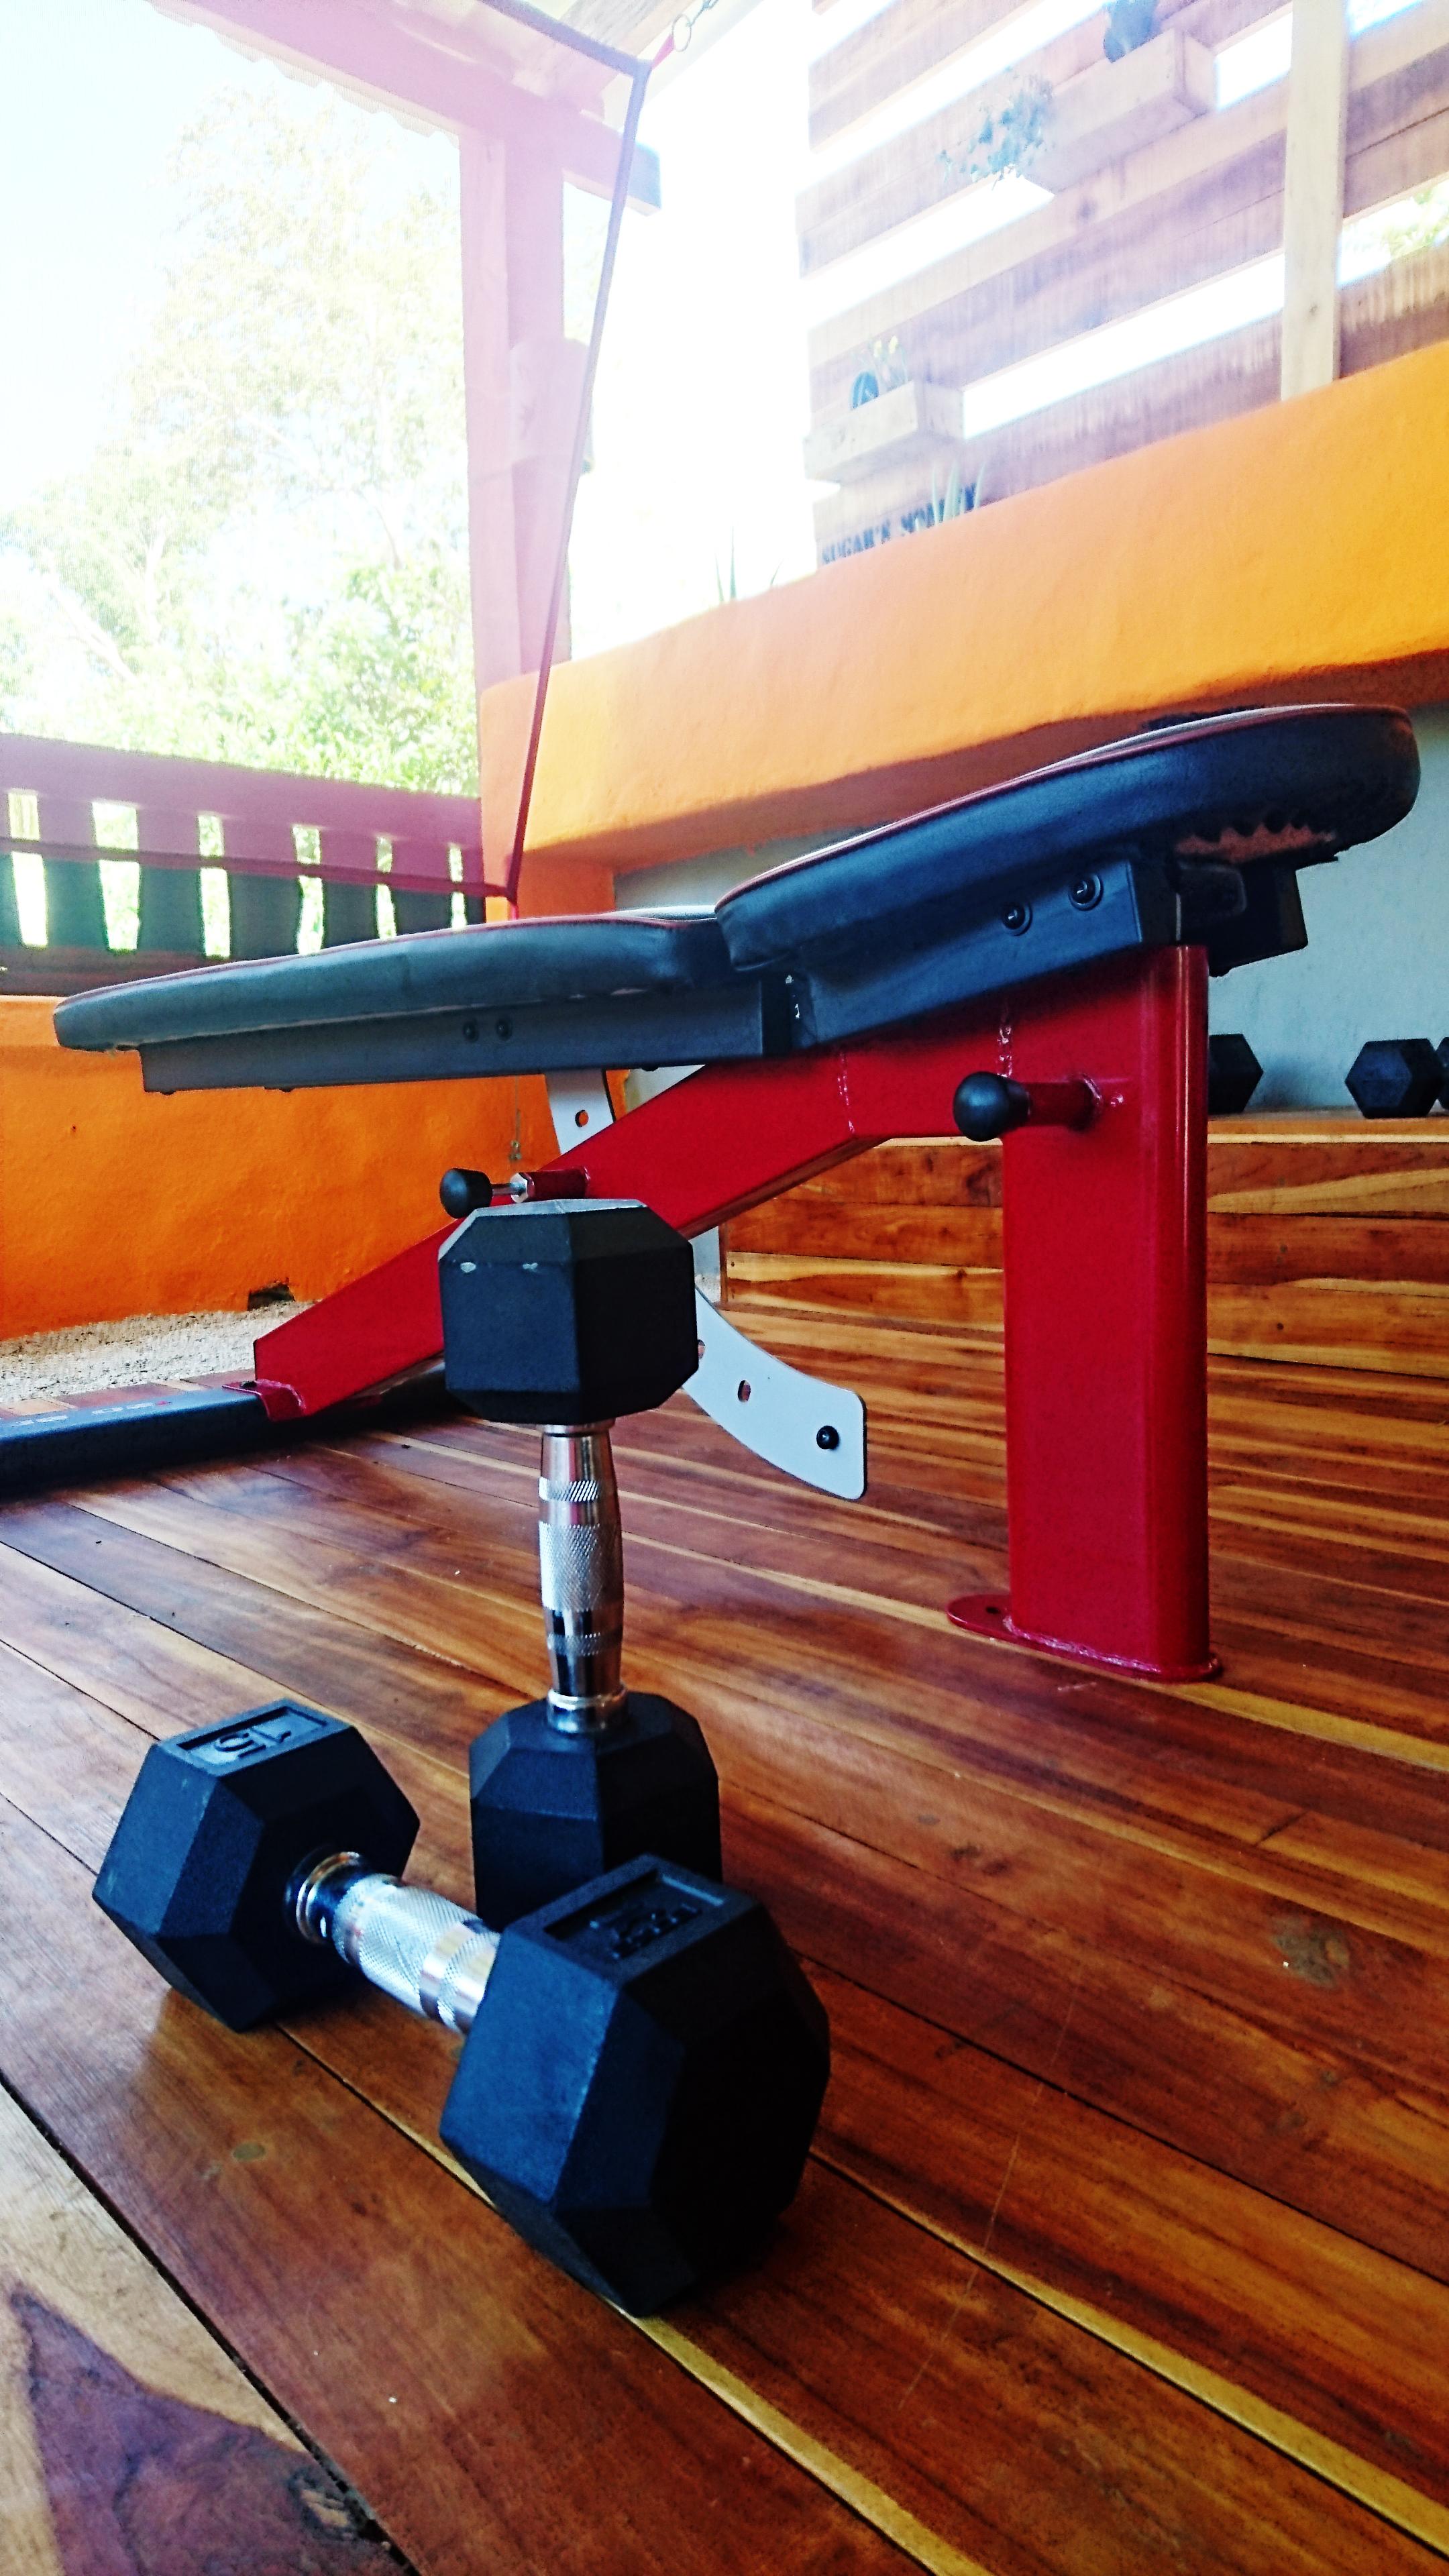 gym_flat_bench_3_sugars_monkey_playa_grande_surf_poshtel_hotel_surf_school_trip_surfcamp_costa_rica_